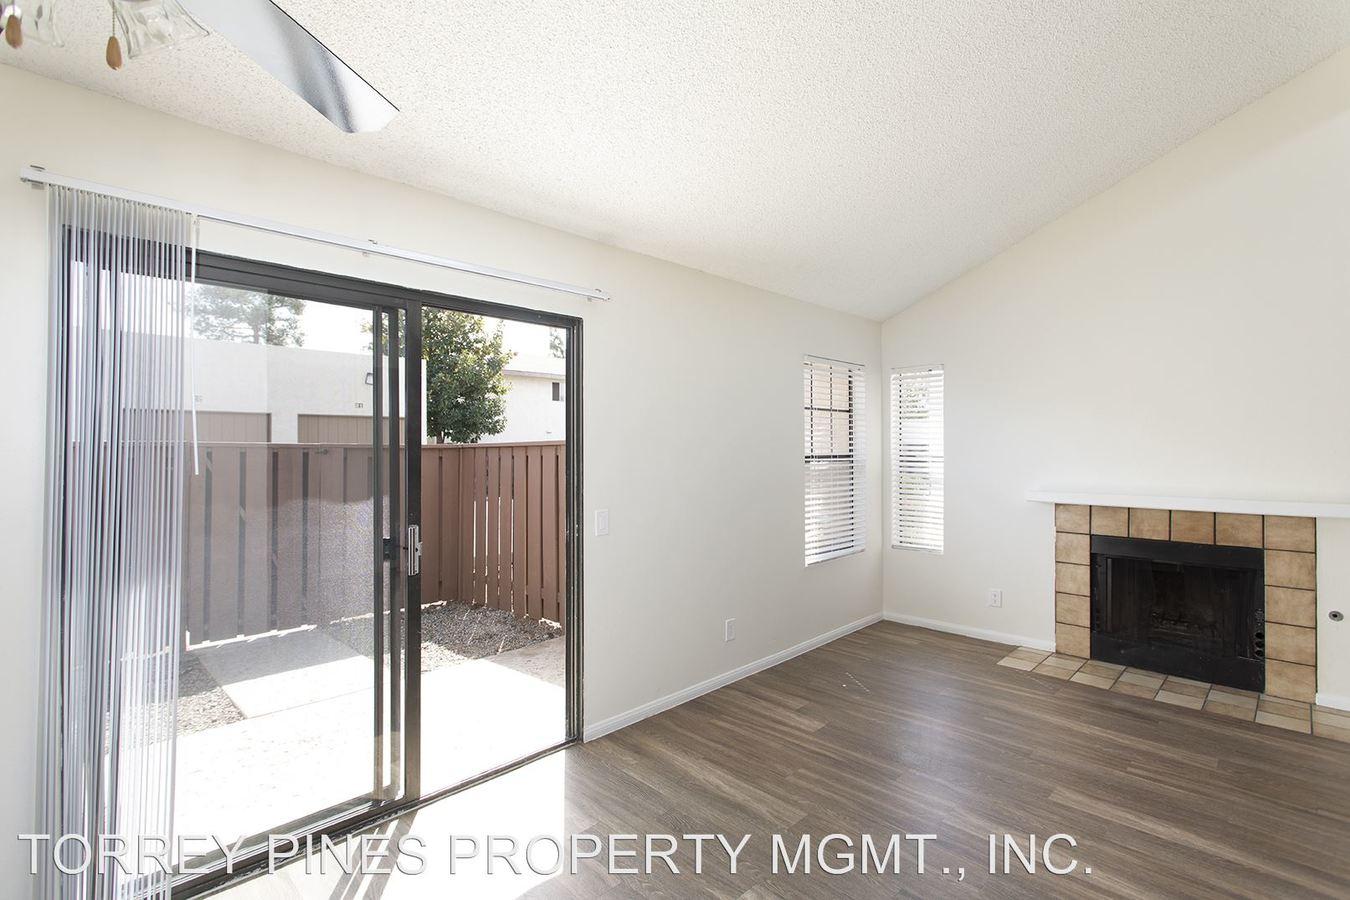 2 Bedrooms 1 Bathroom Apartment for rent at 1141 N. Escondido Boulevard in Escondido, CA